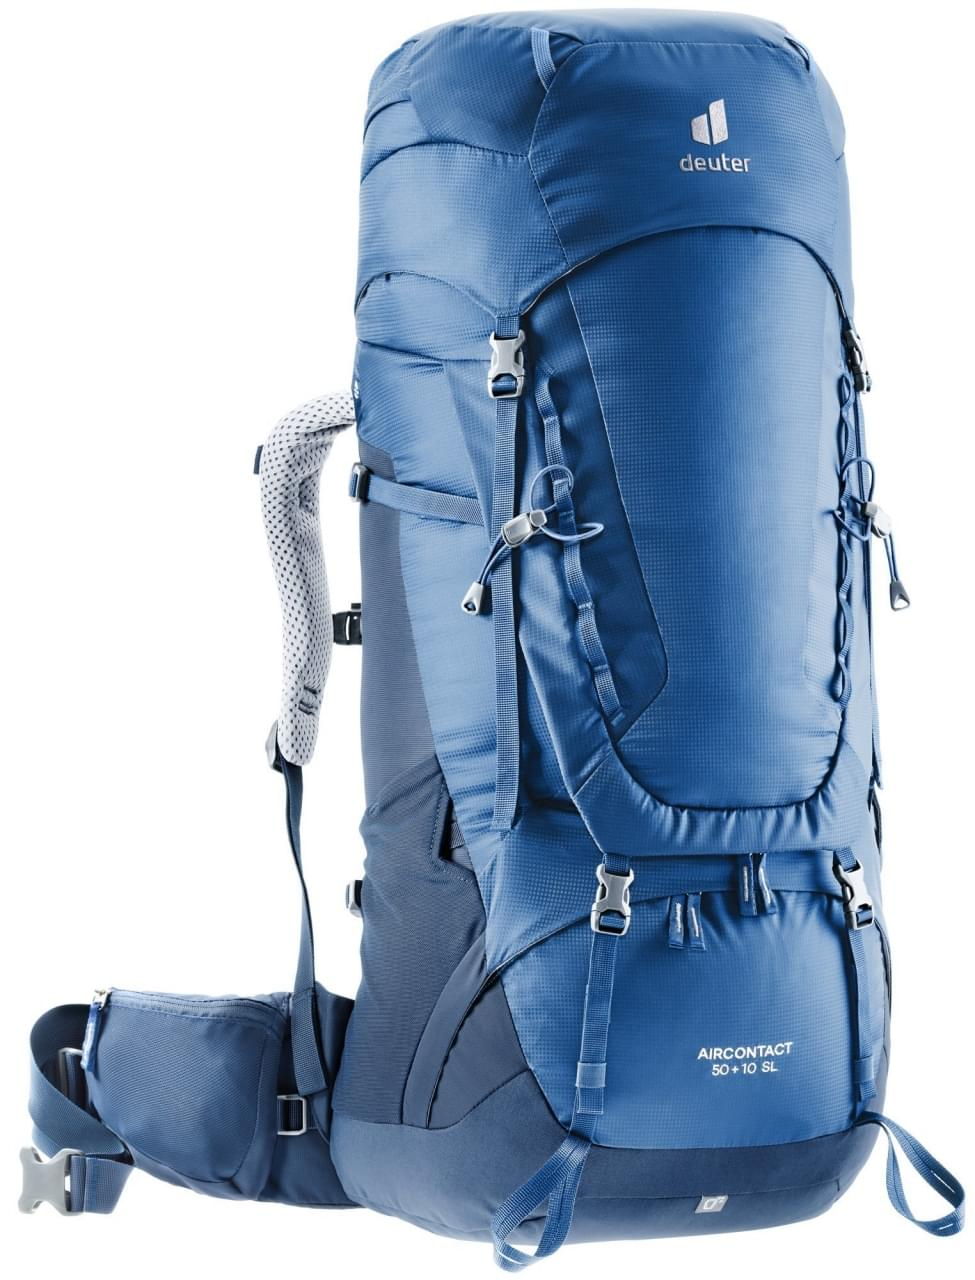 Deuter Aircontact 50 + 10 SL Backpack Blauw